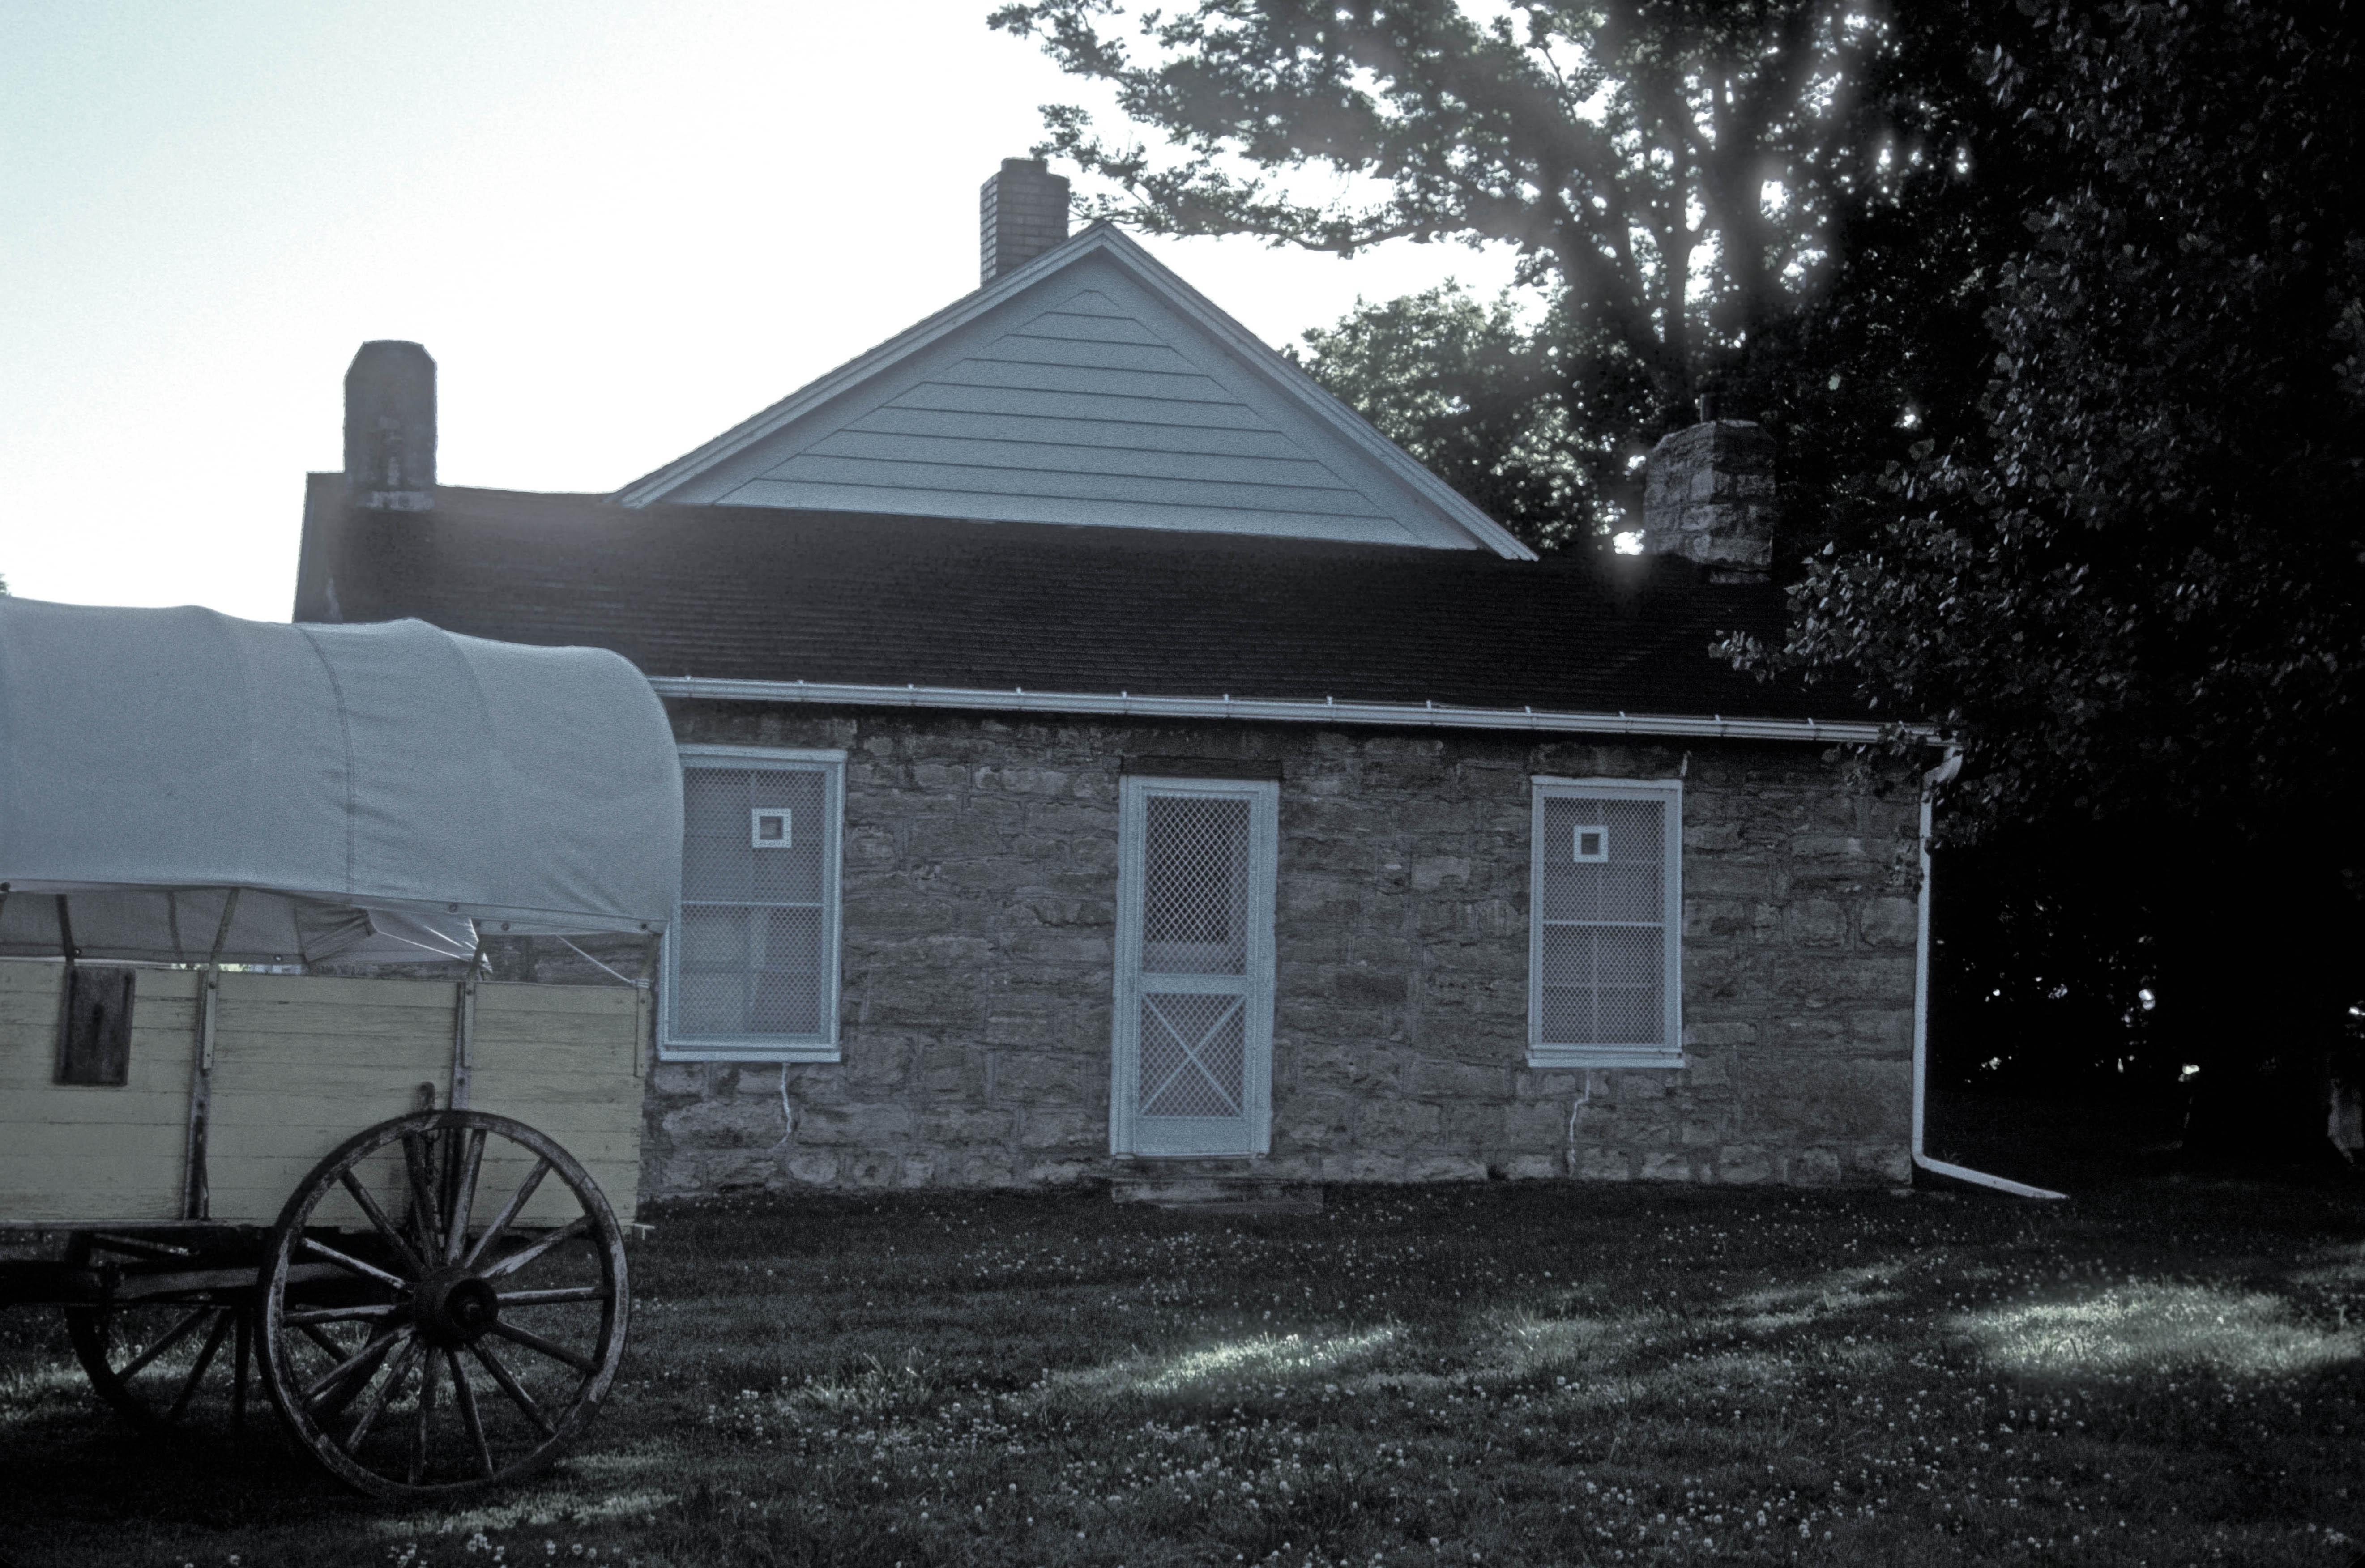 Kansas pottawatomie county fostoria - National Register Of Historic Places Listings In Pottawatomie County Kansas Wikiwand